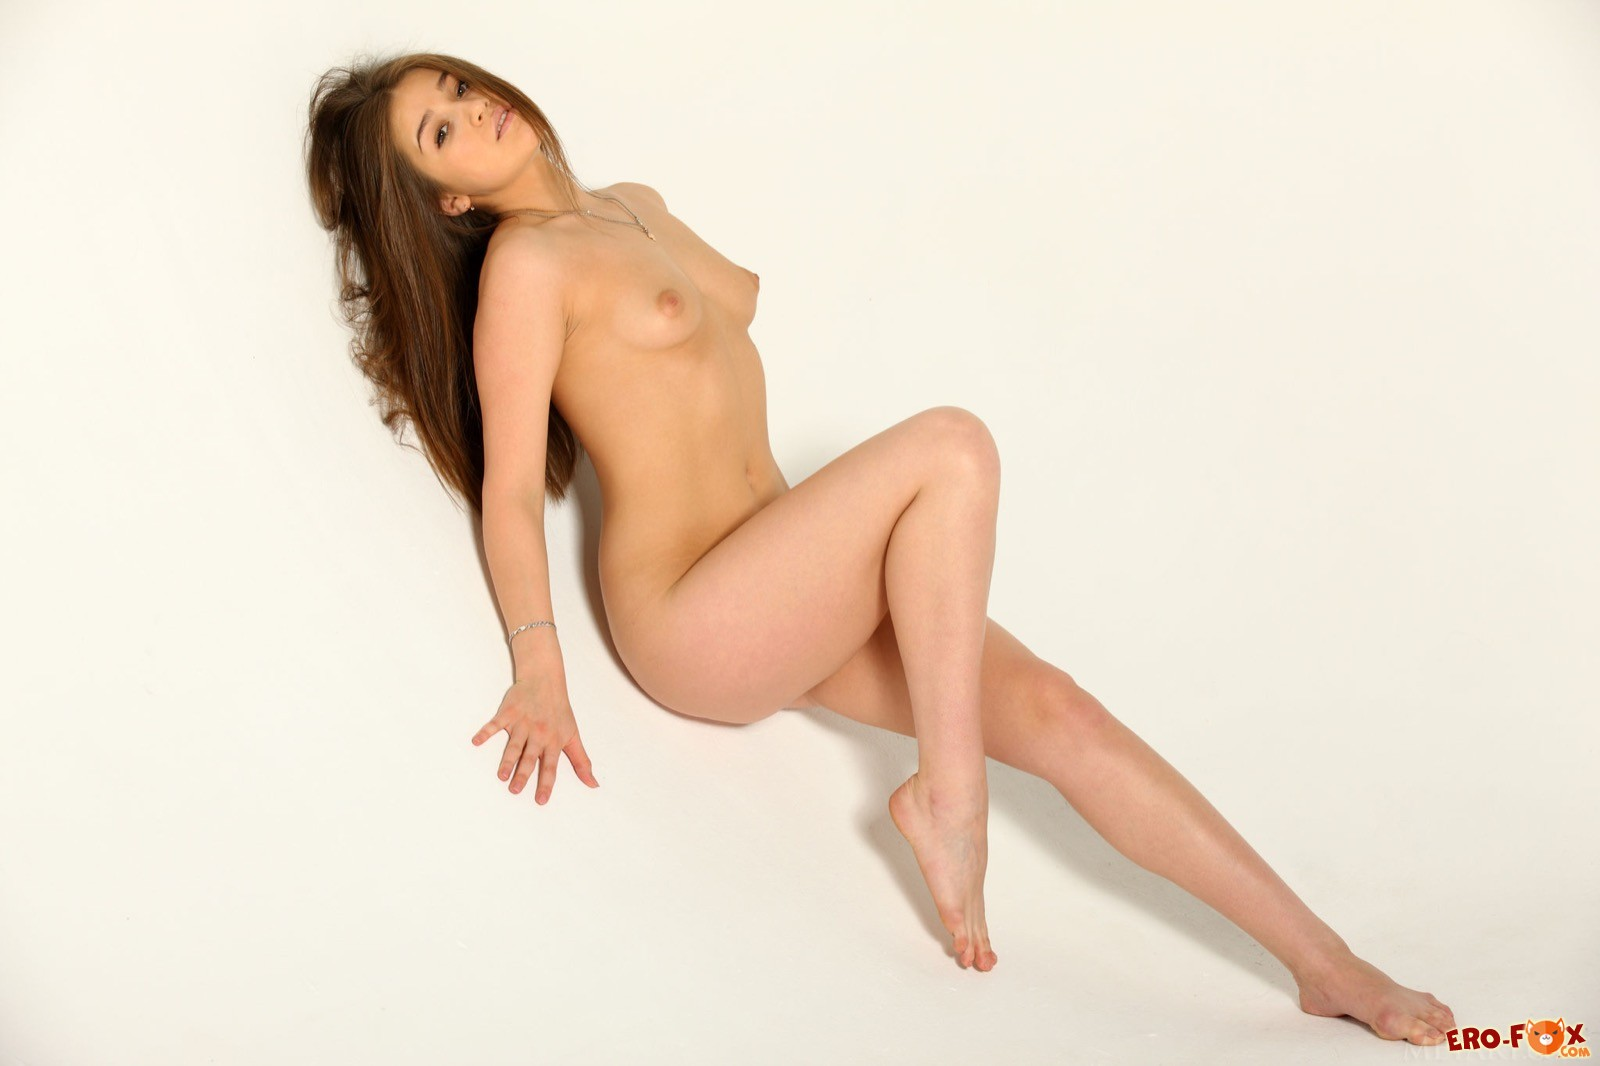 Голая девушка измазала тело маслом